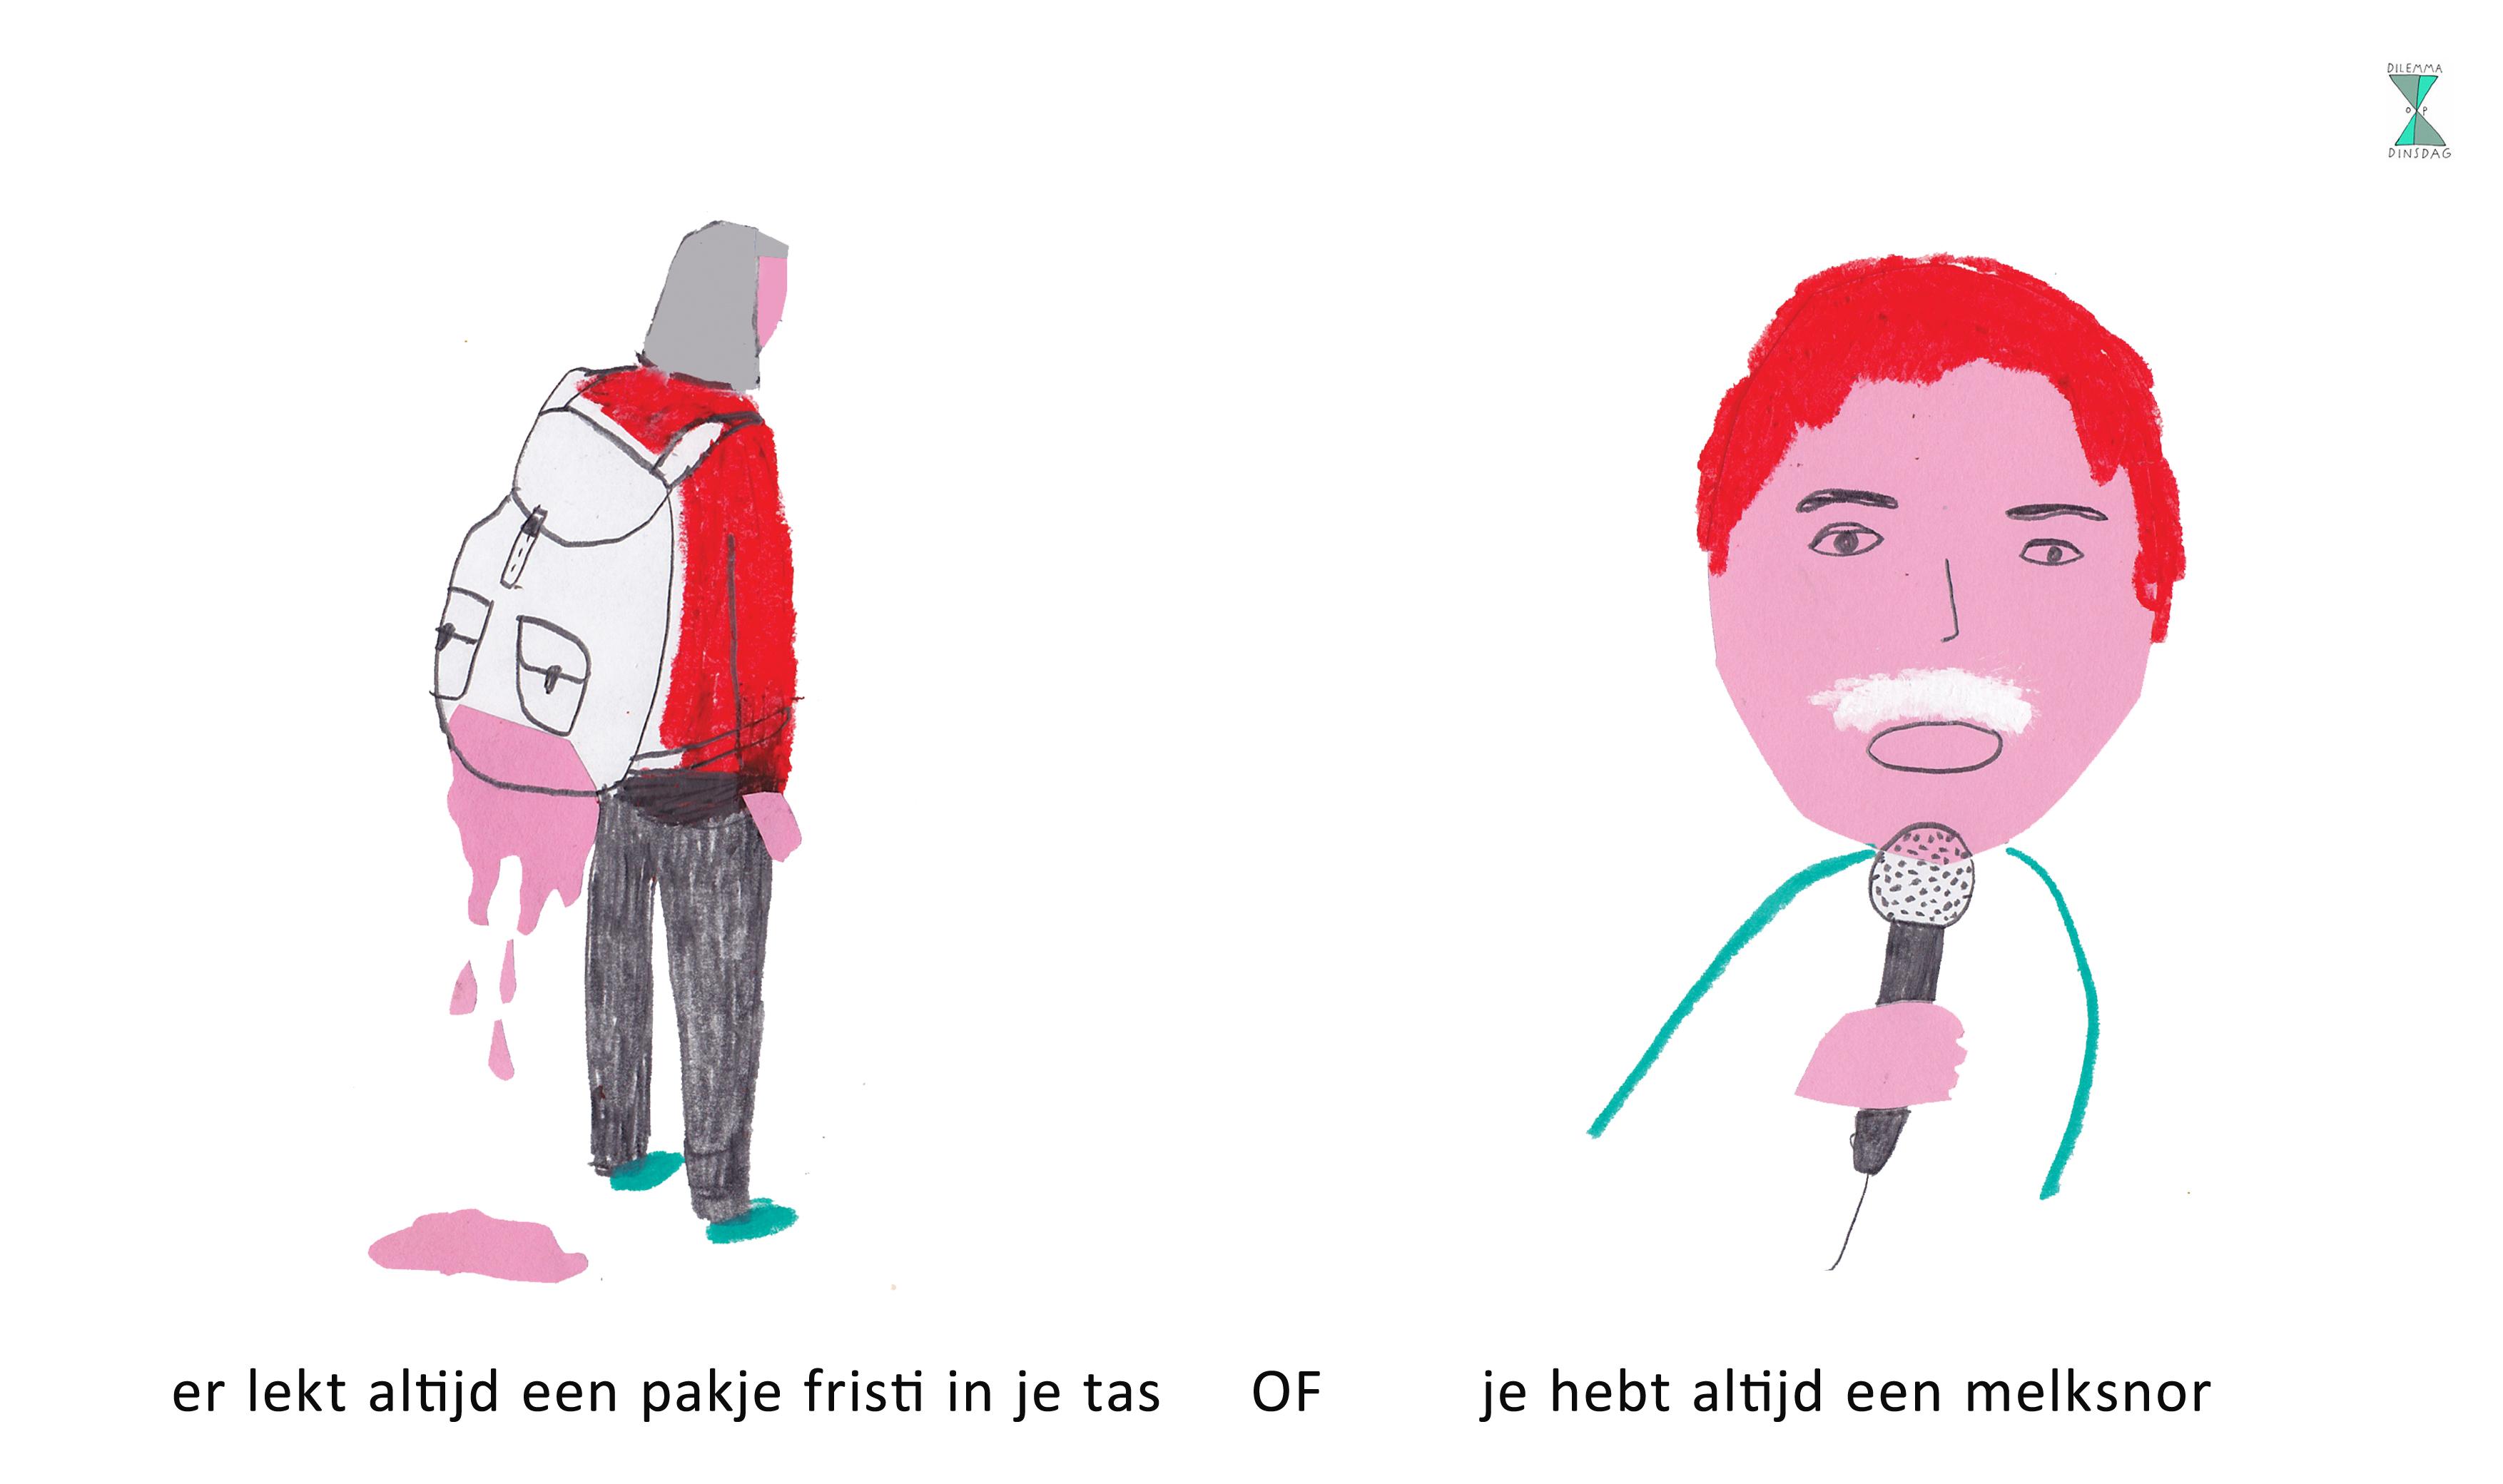 Dilemma op dinsdag: je moet kiezen - Flow Magazine NL